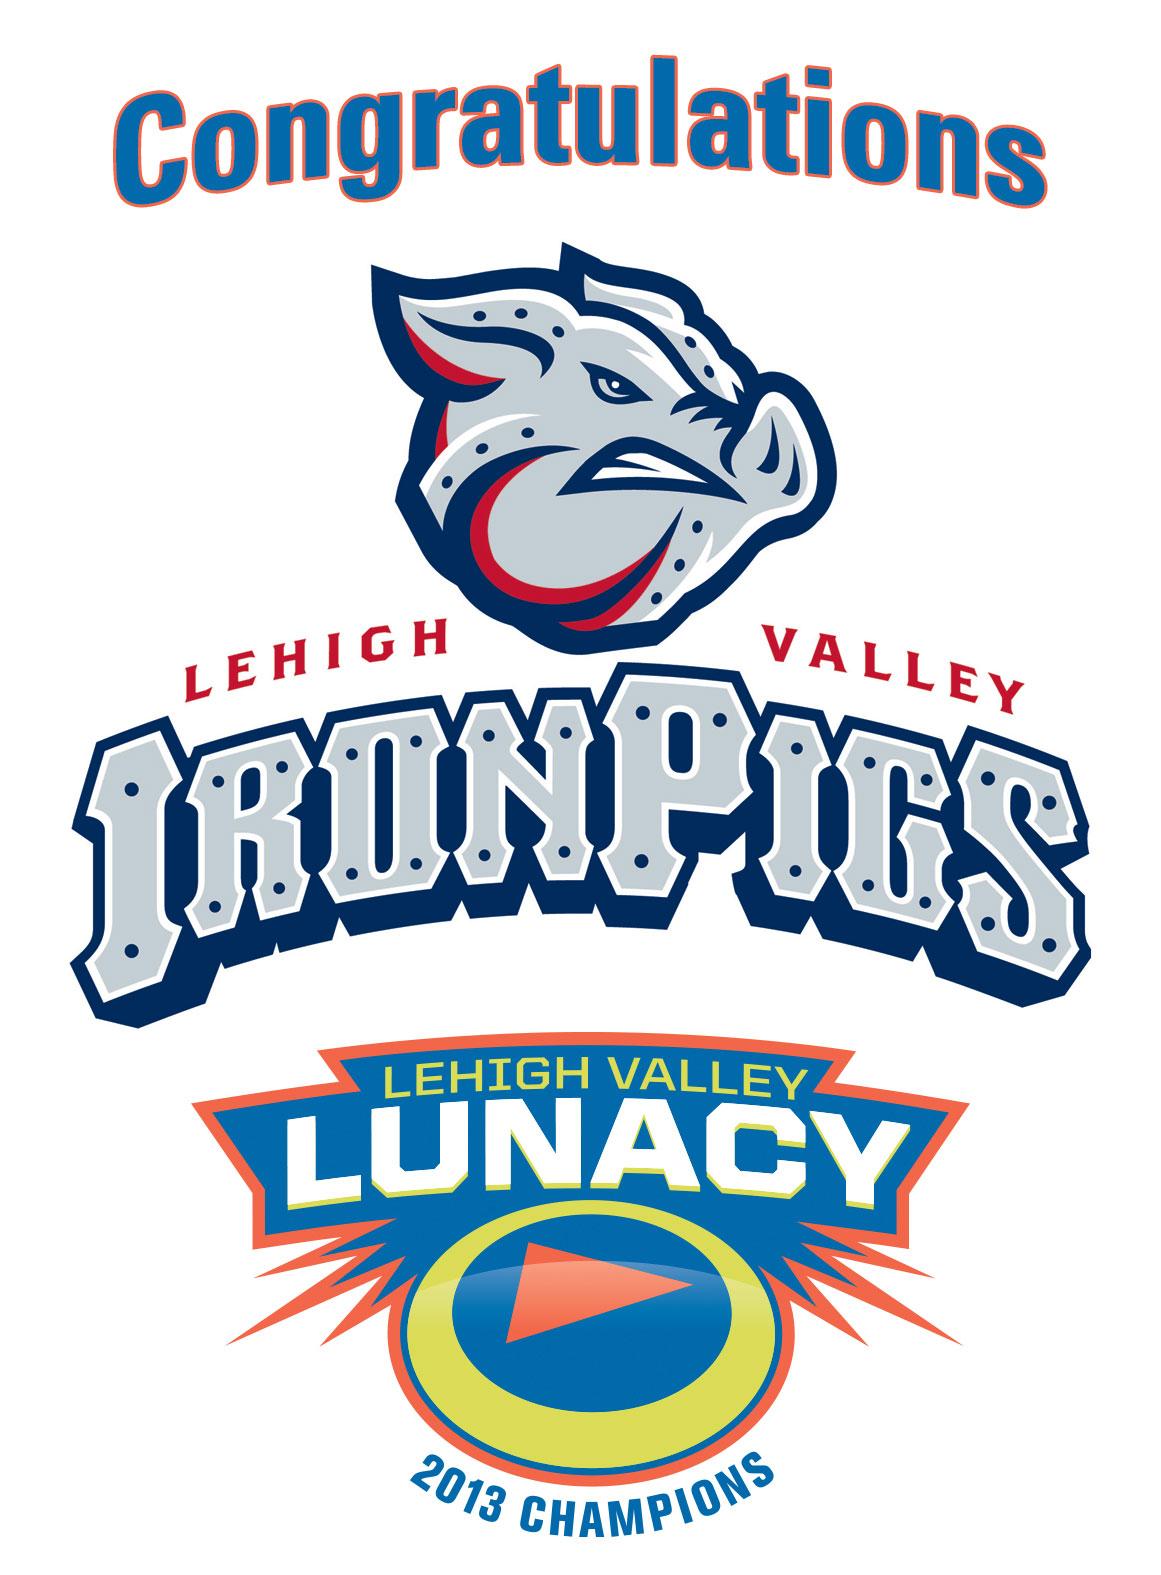 2013LunacyChamps